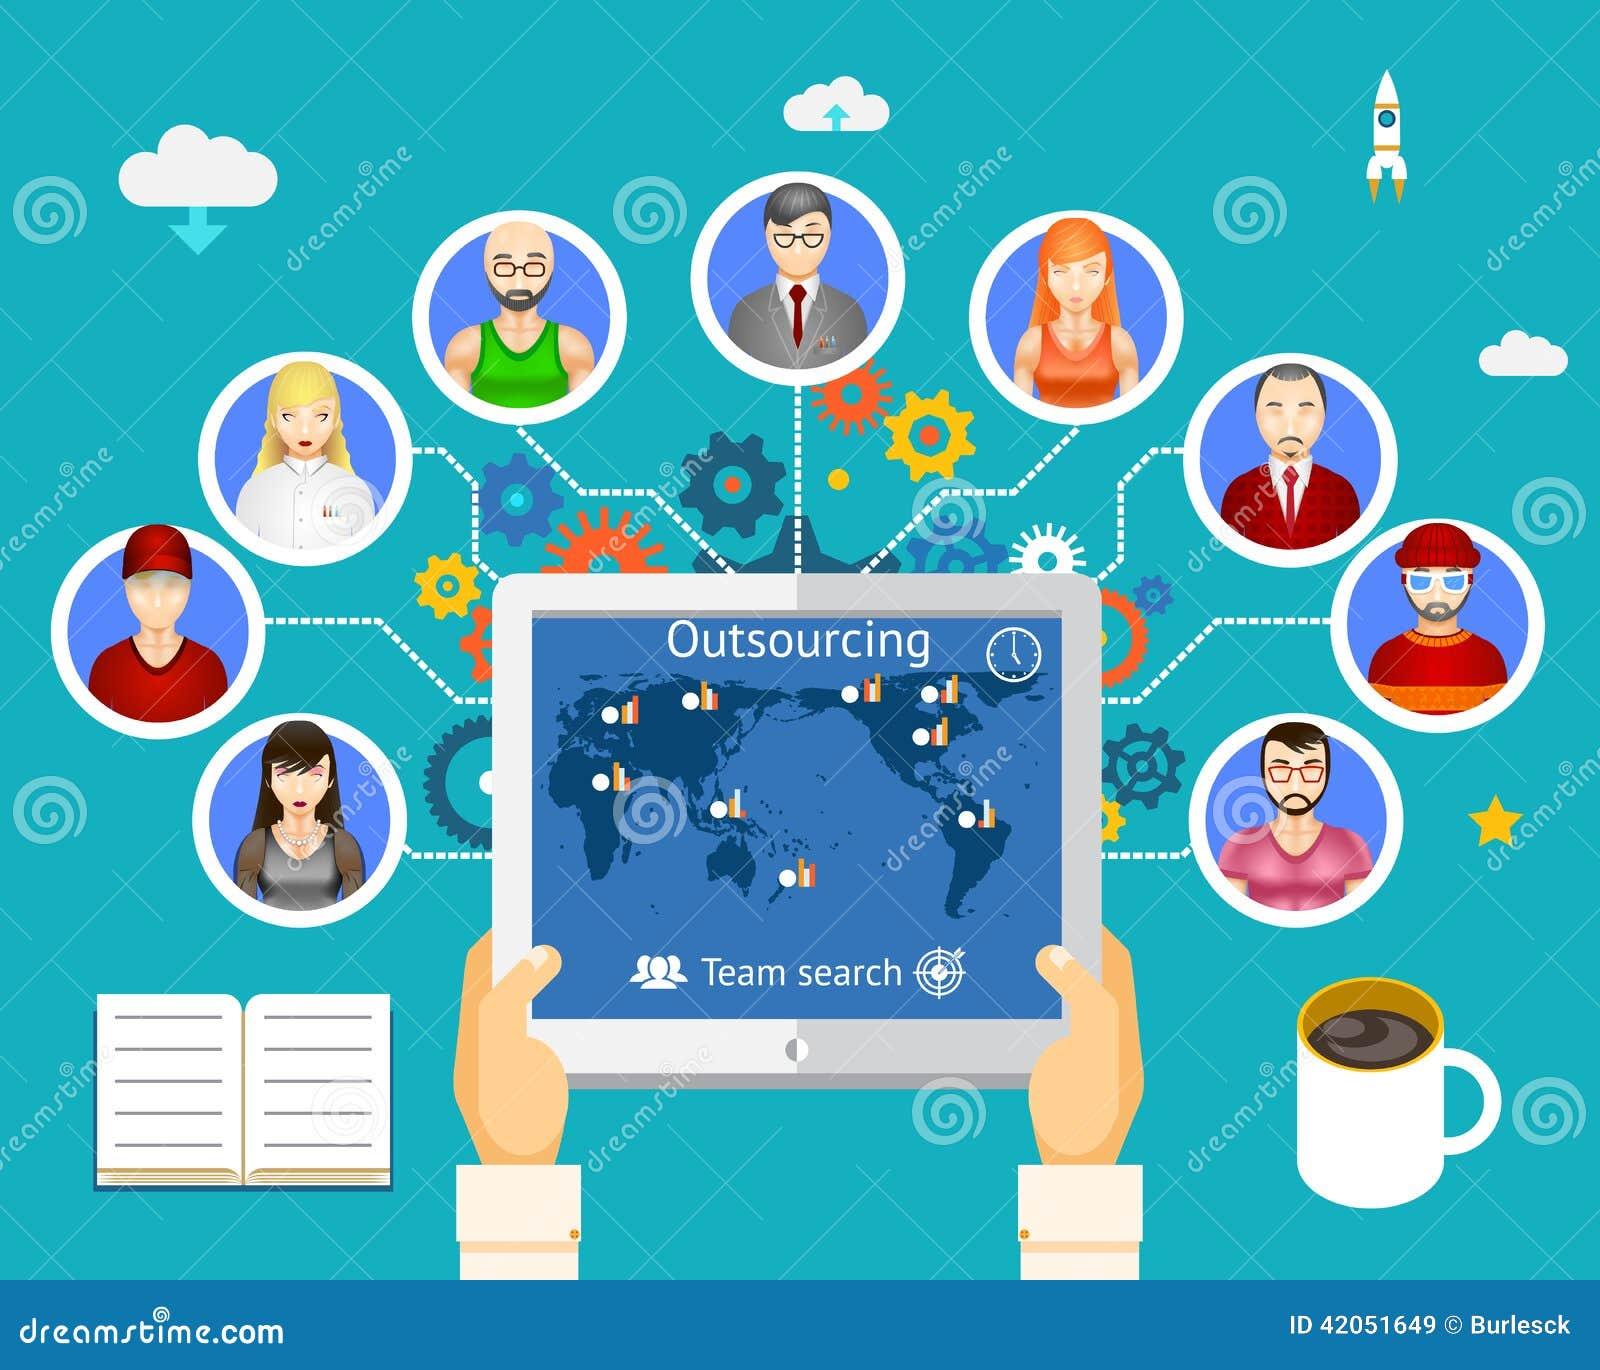 download Adaptive Governance: